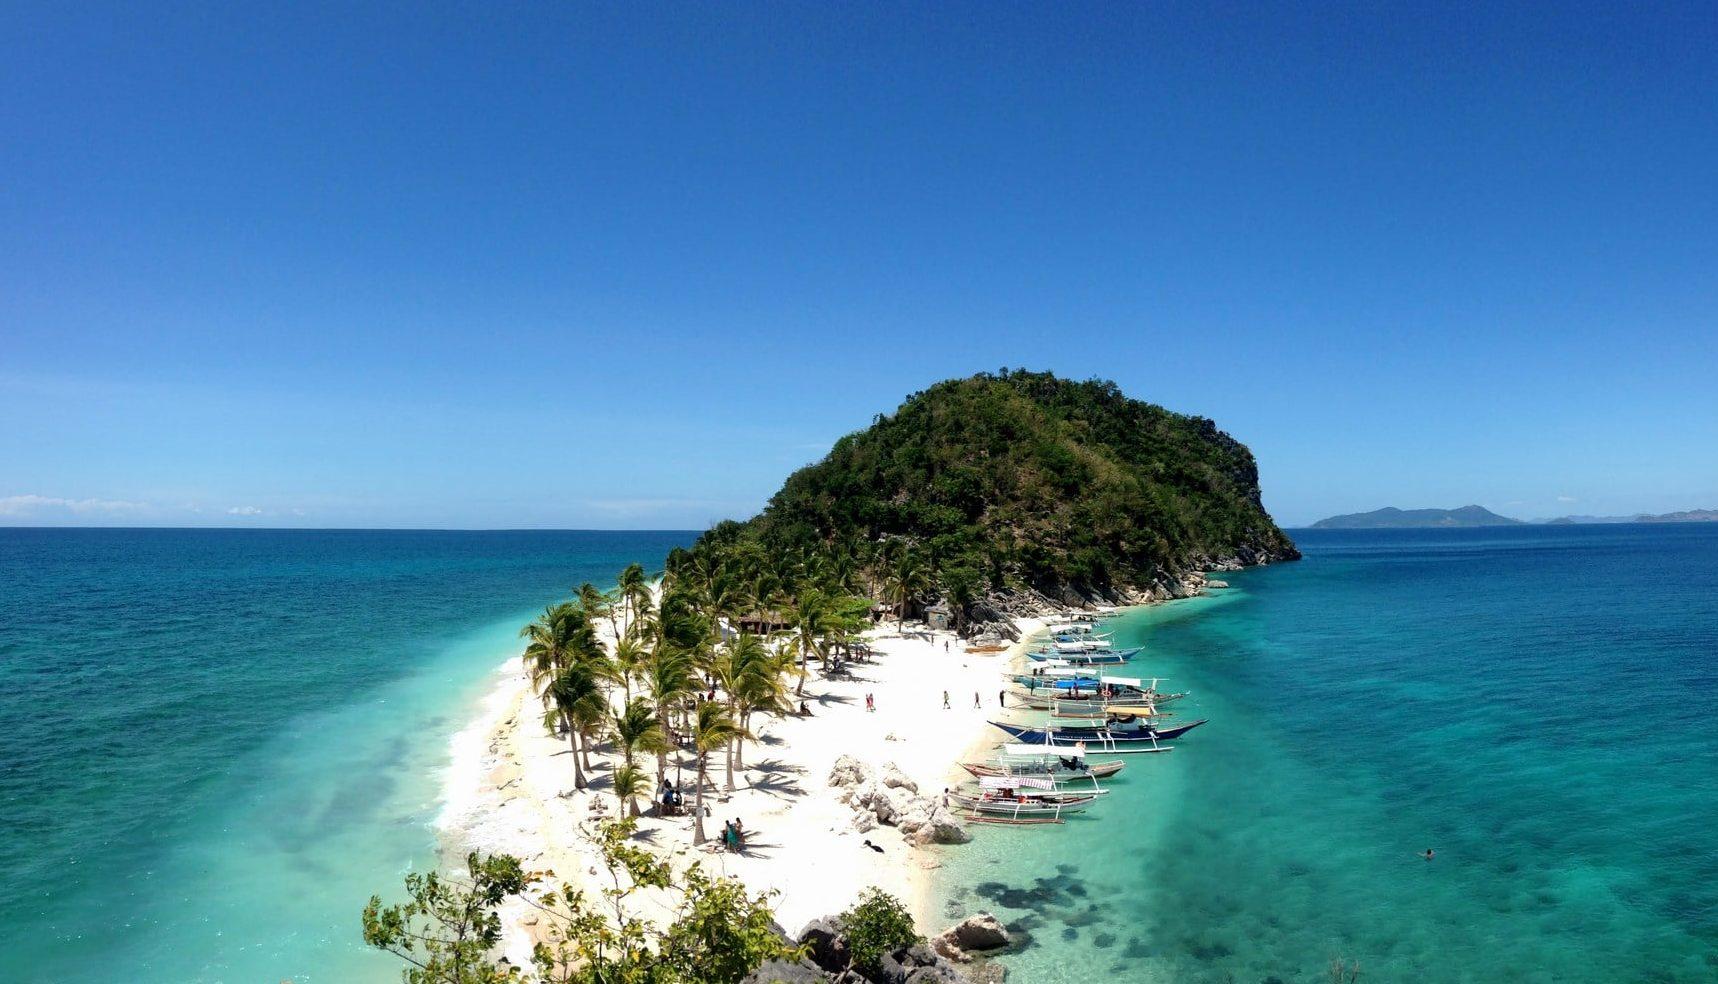 archipielago malayo 3